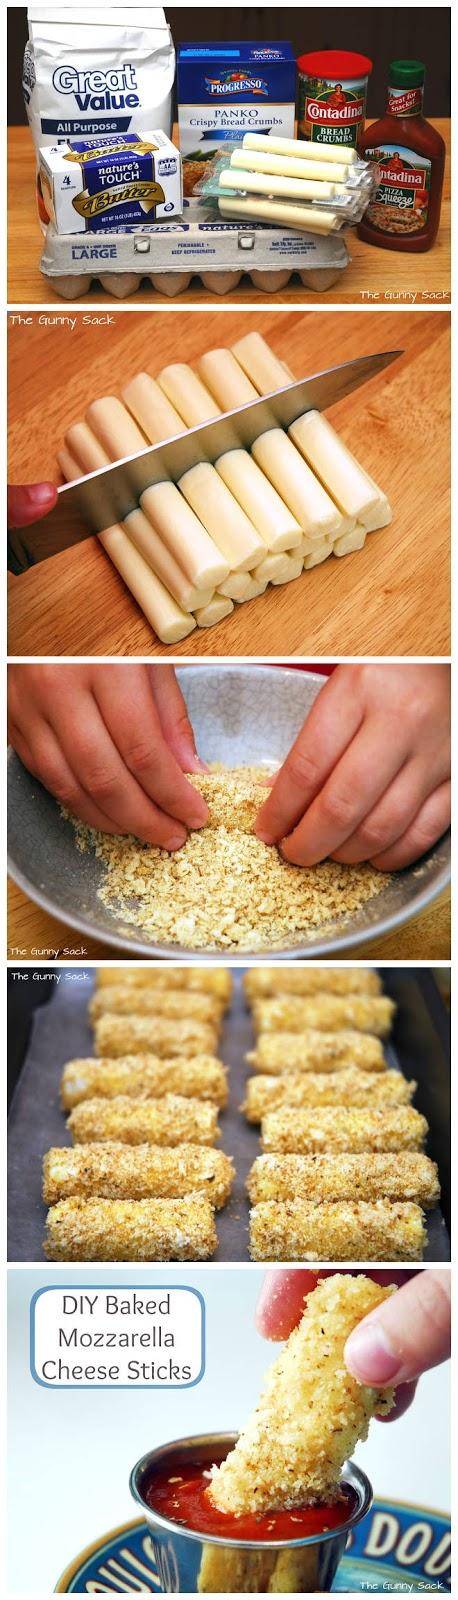 Baked Mozzarella Cheese Sticks - Recipebest